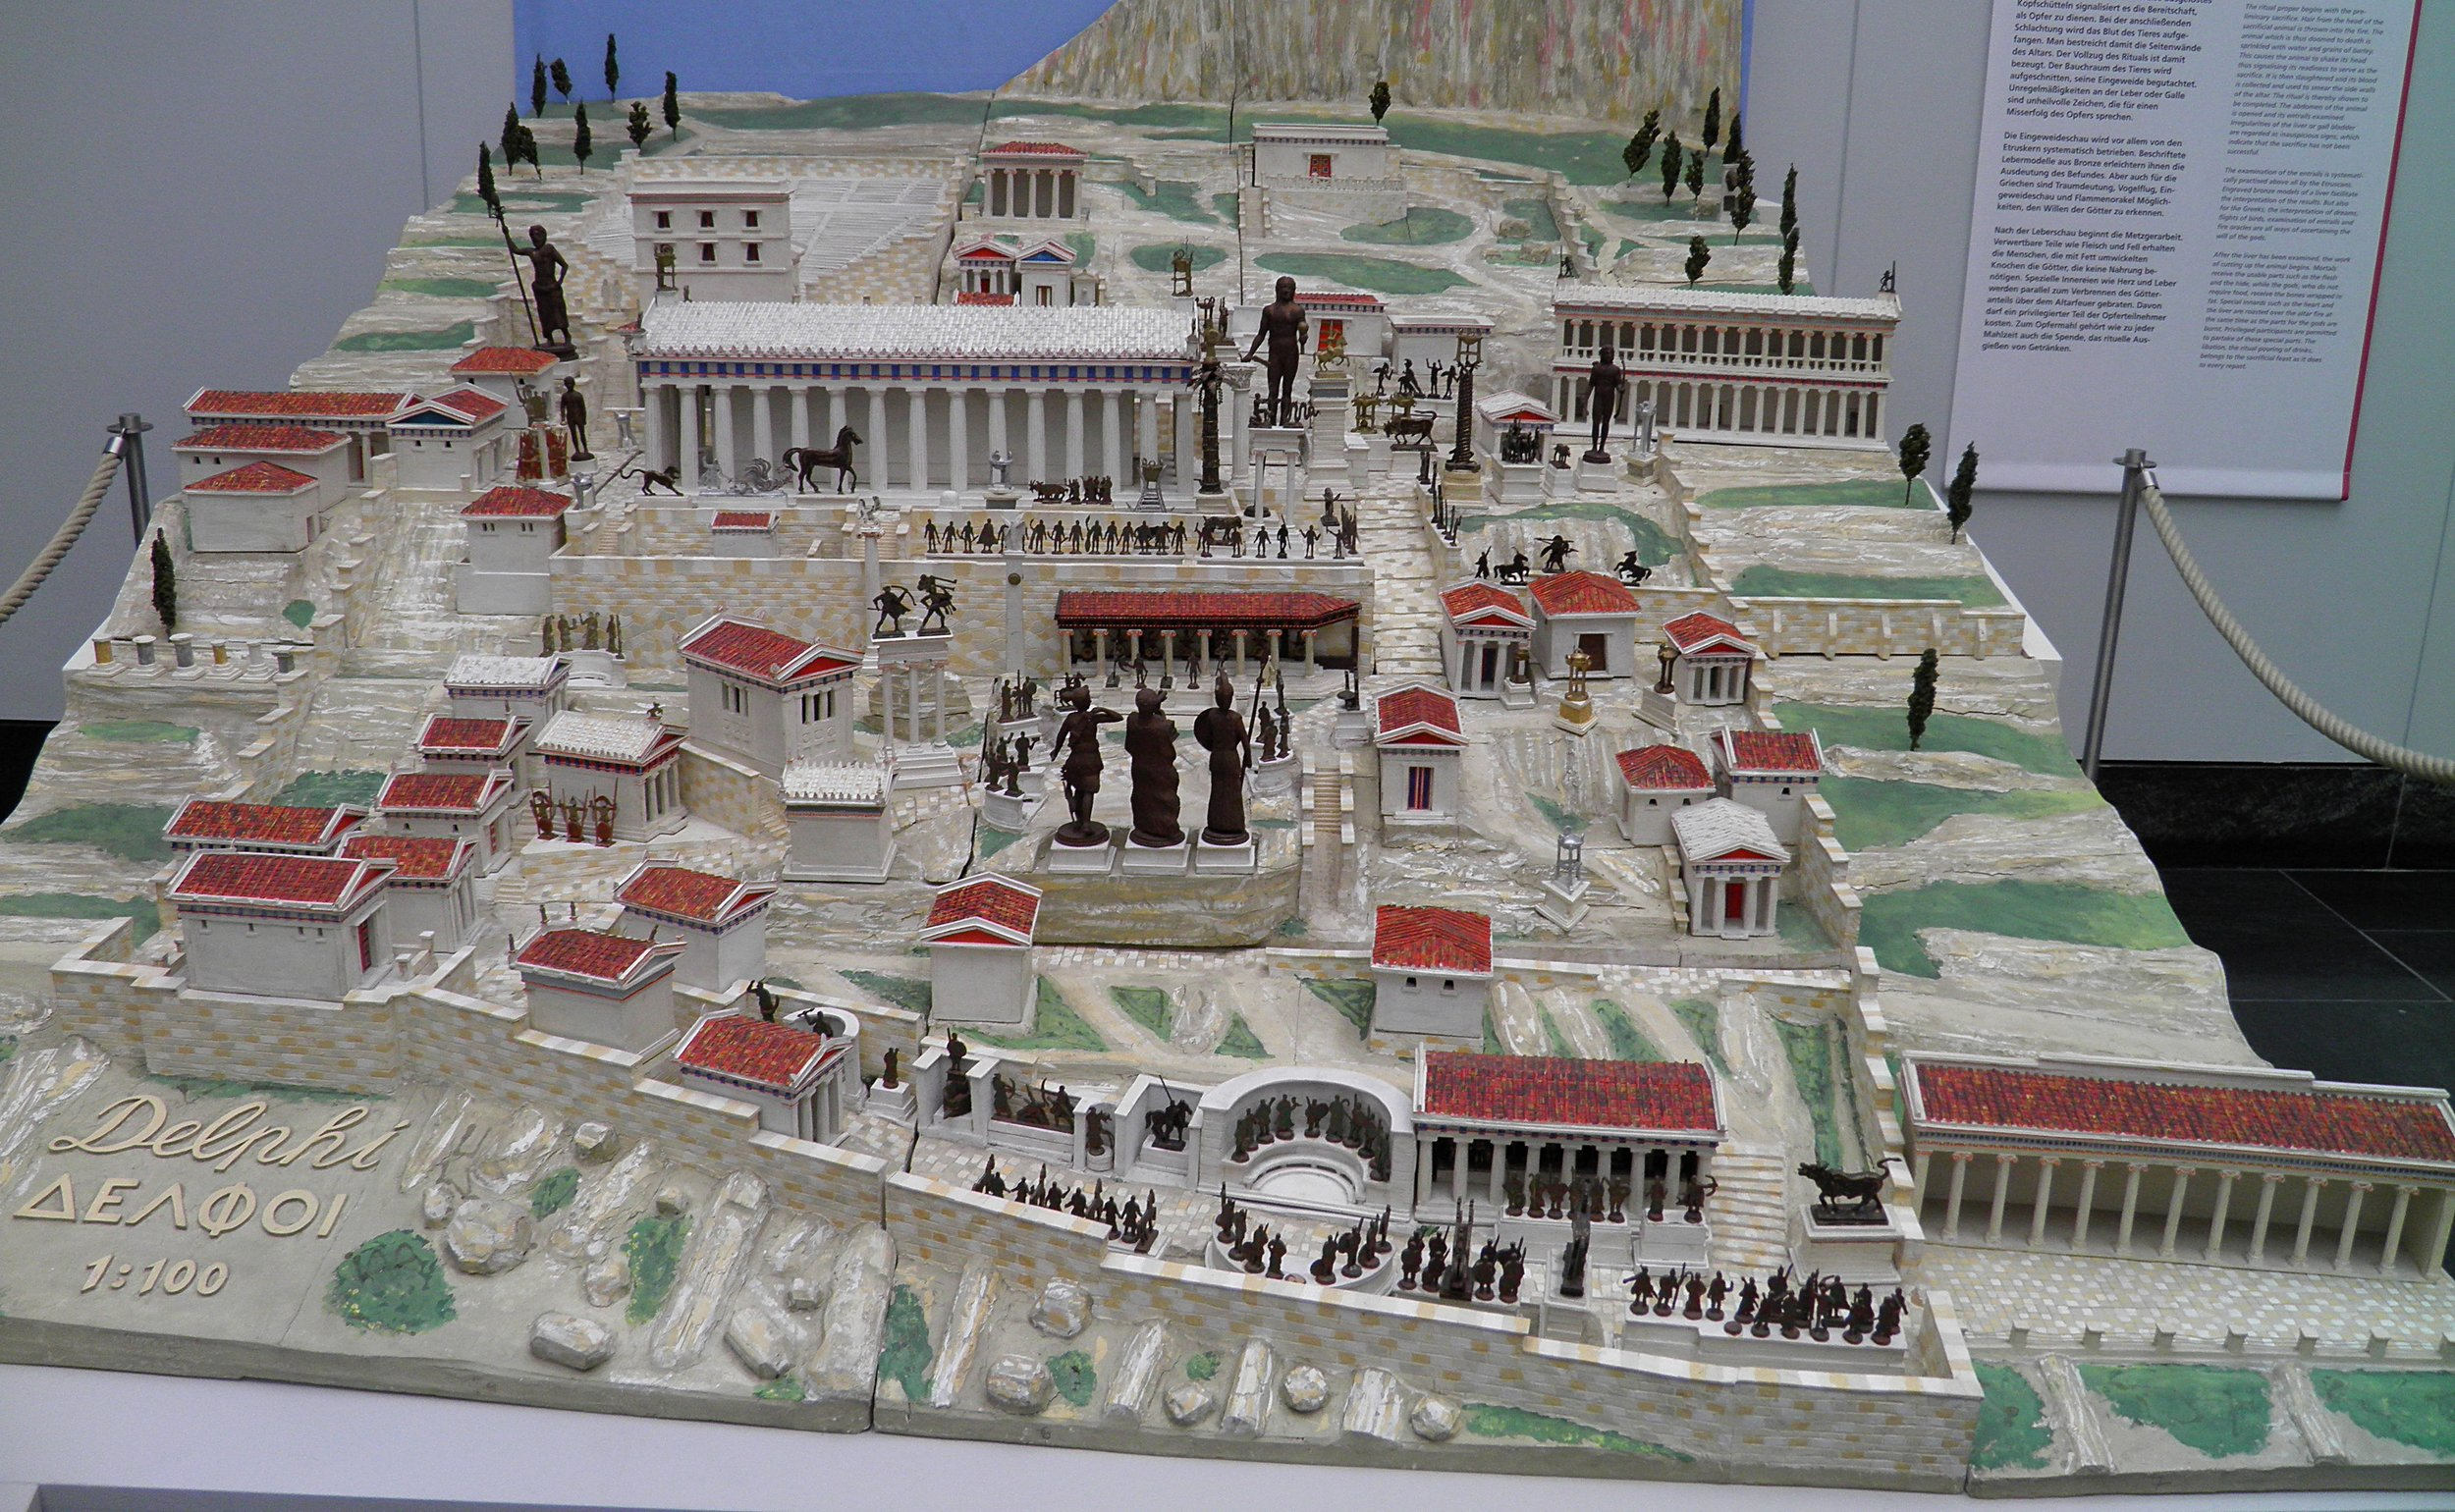 Carole Raddato -  https://commons.wikimedia.org/wiki/File:Model_of_Delphi,_Staatliche_Antikensammlungen,_Munich_(8958336066).jpg